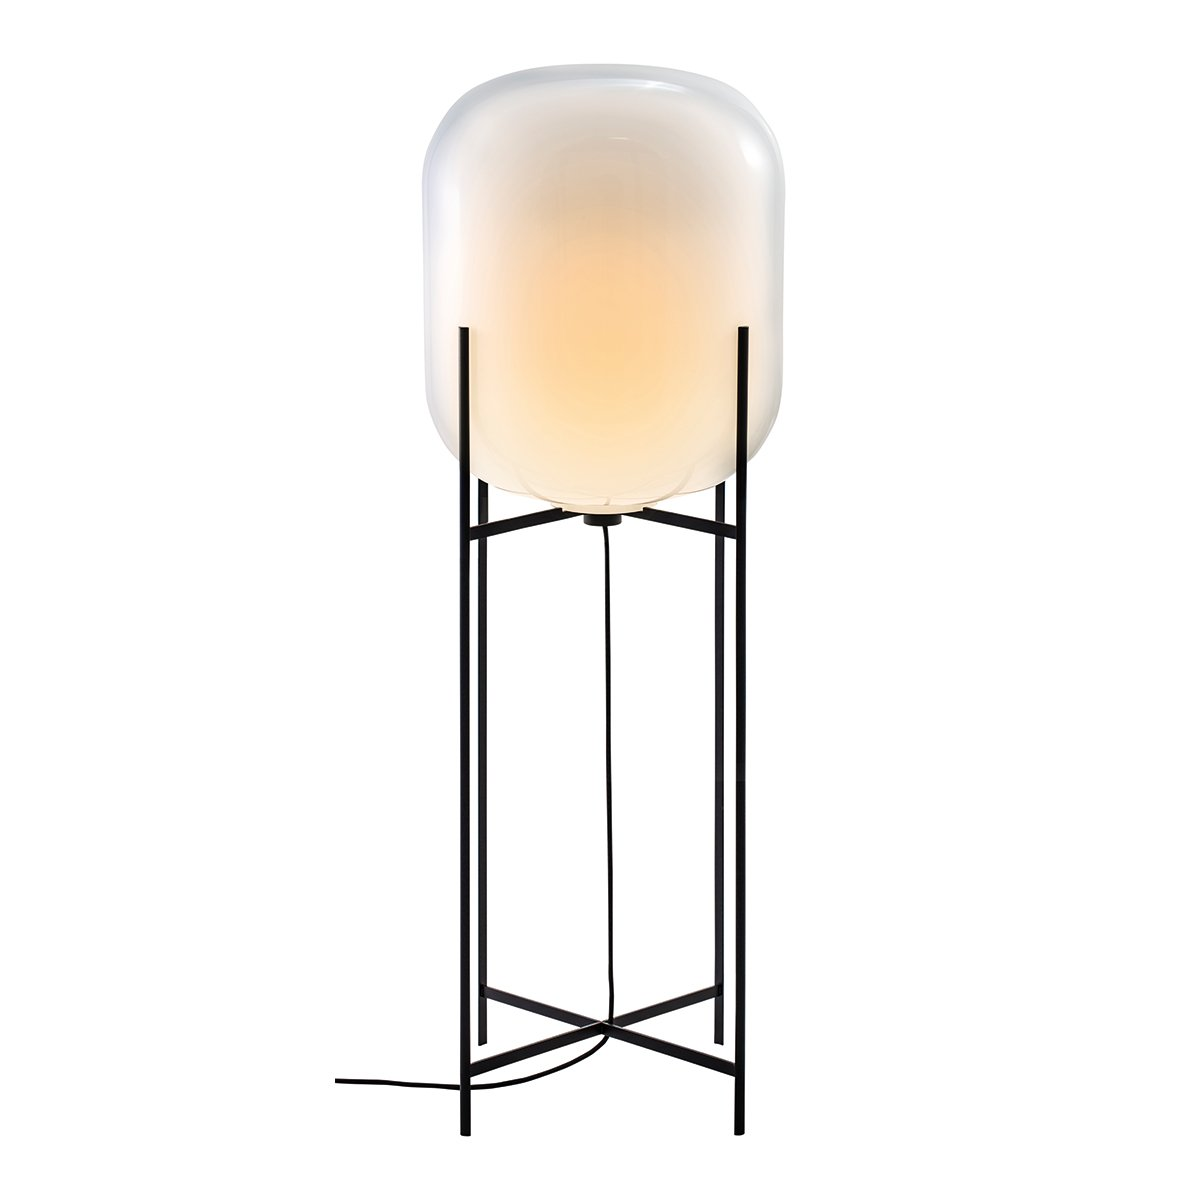 Pulpo Oda Vloerlamp Large (2014) - Wit / Zwart